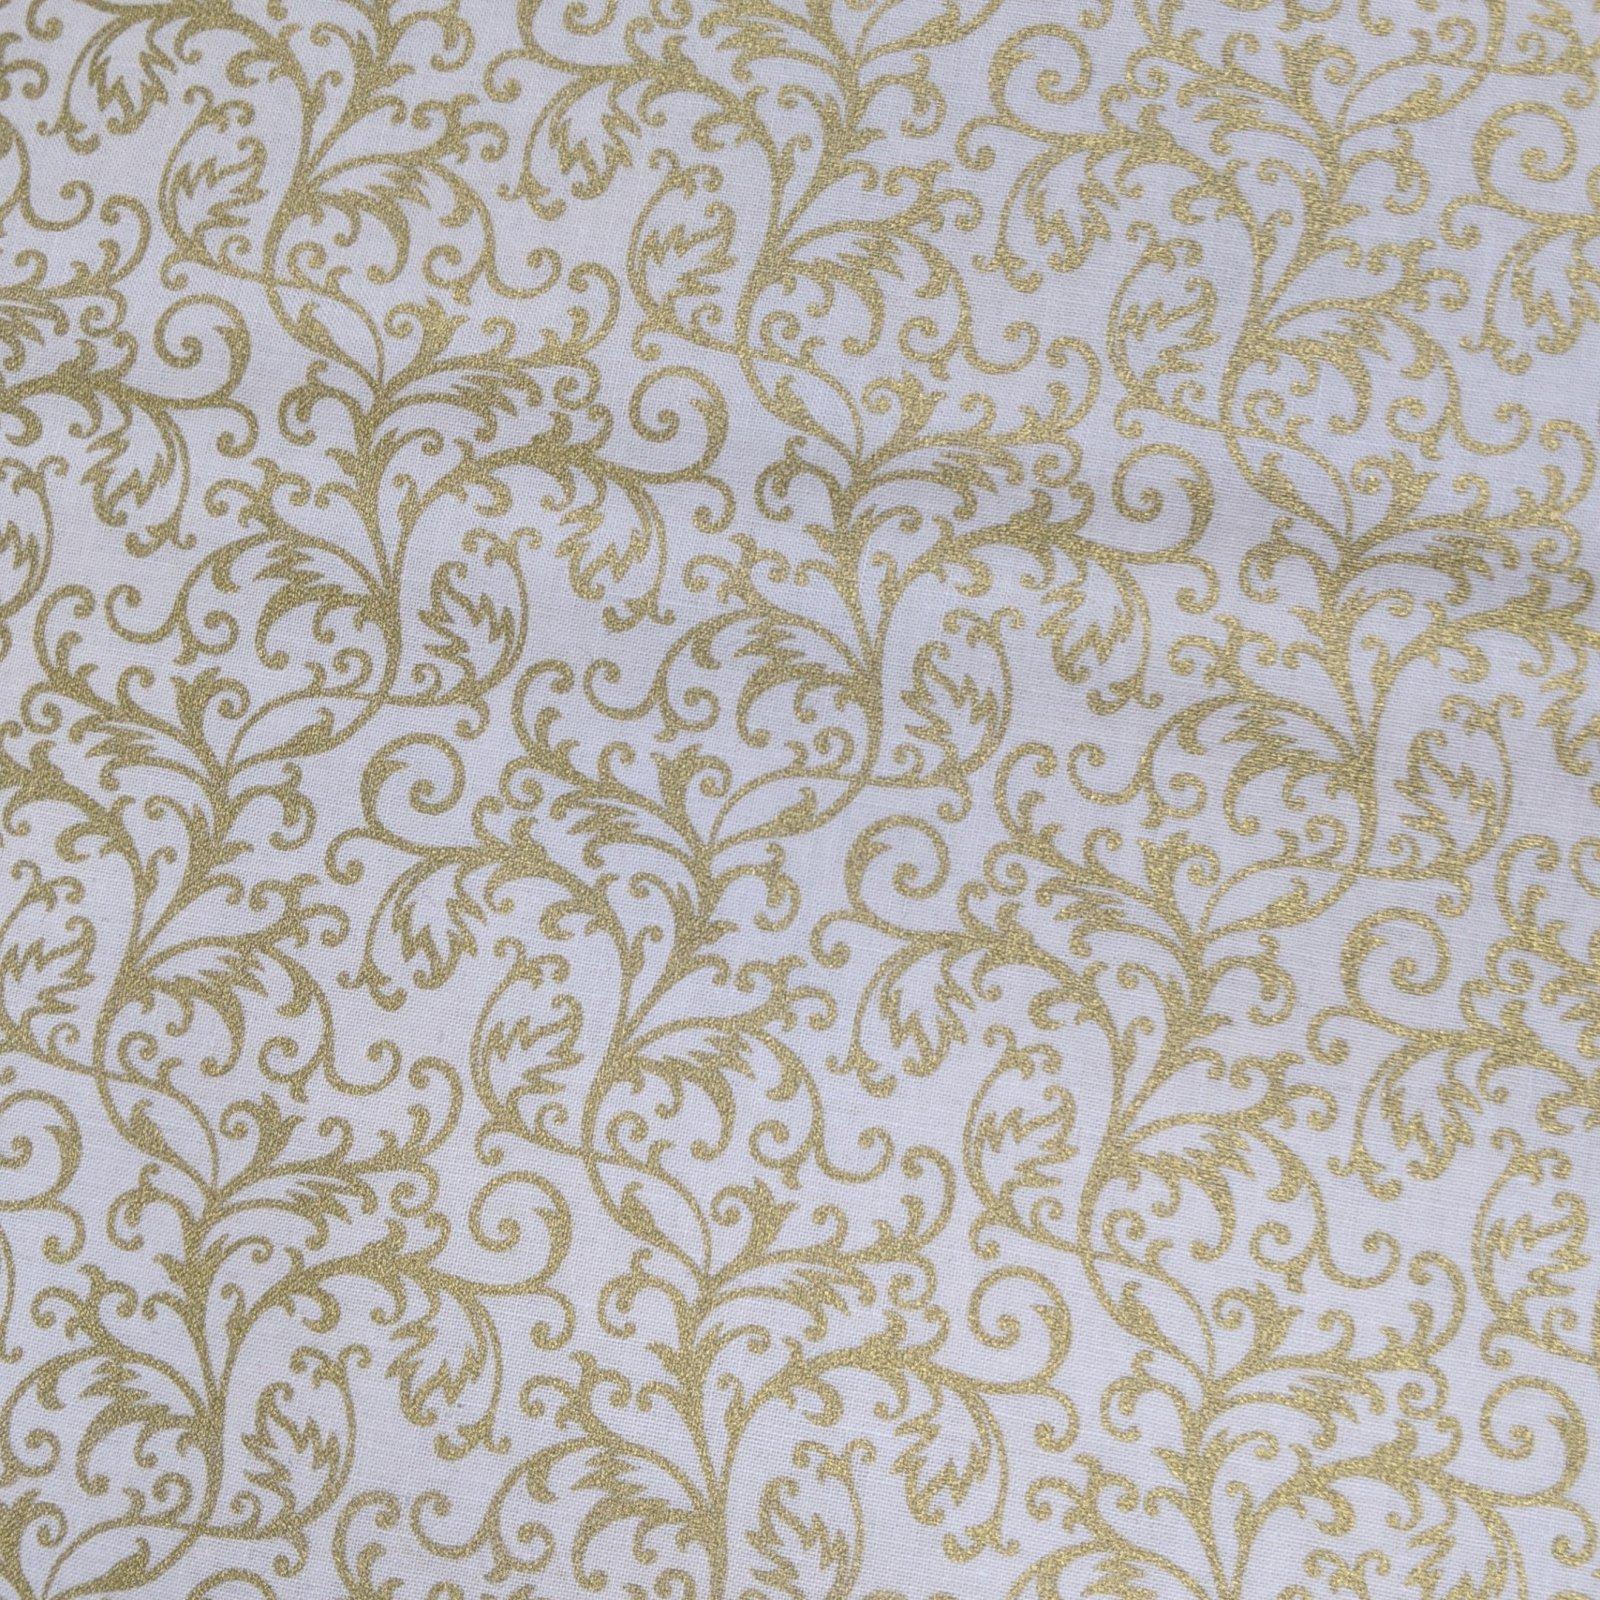 Broadcloth Print 100% Cotton Gold Filigree